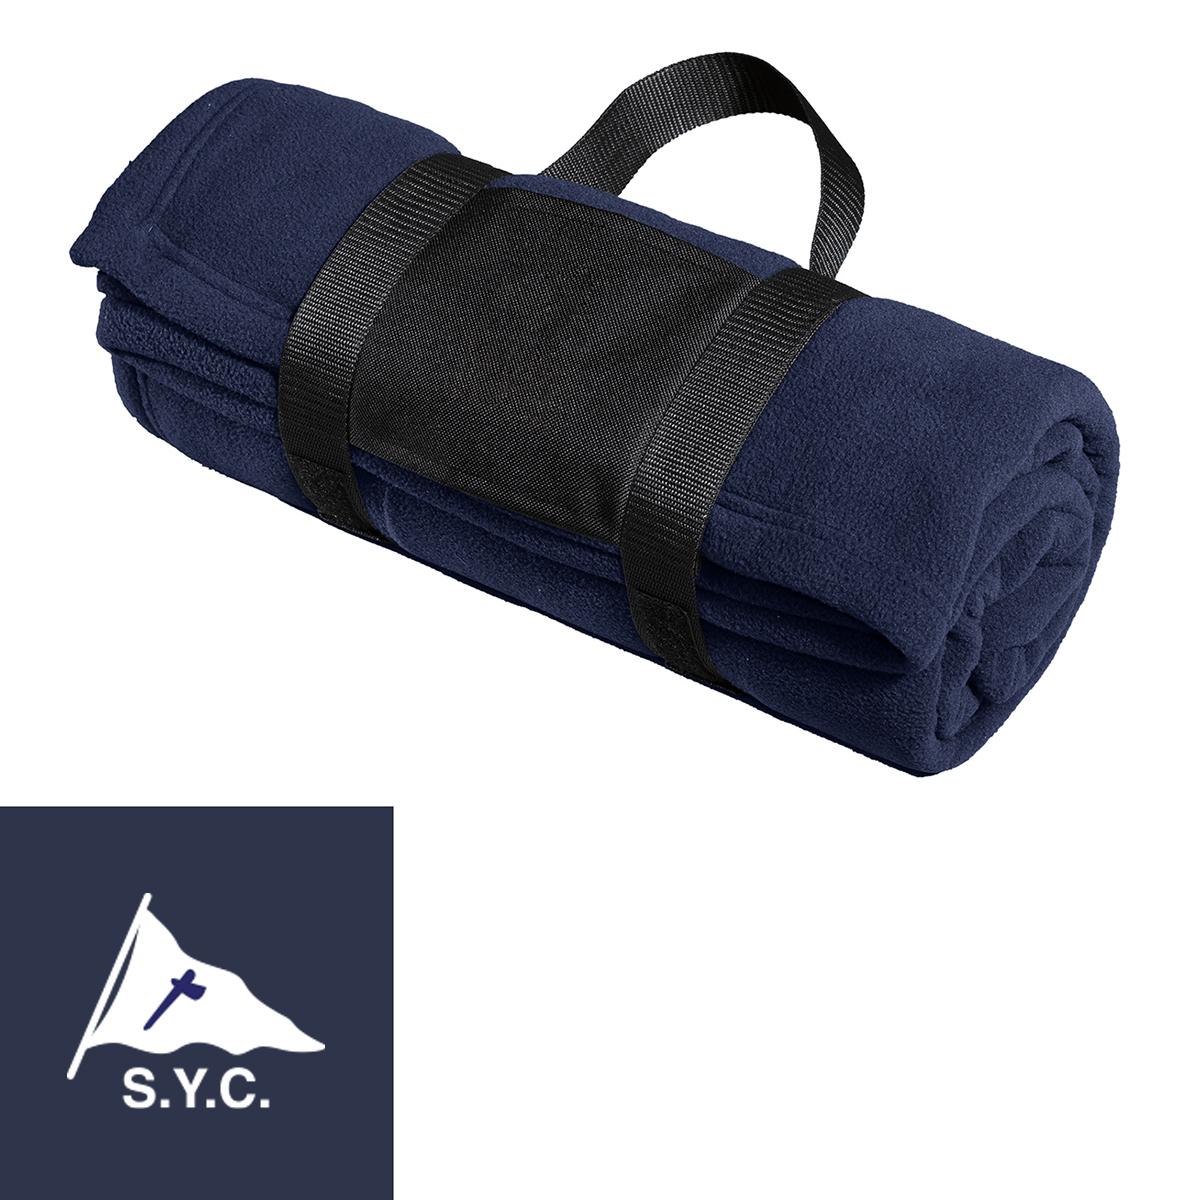 SQUANTUM YC - FLEECE BLANKET